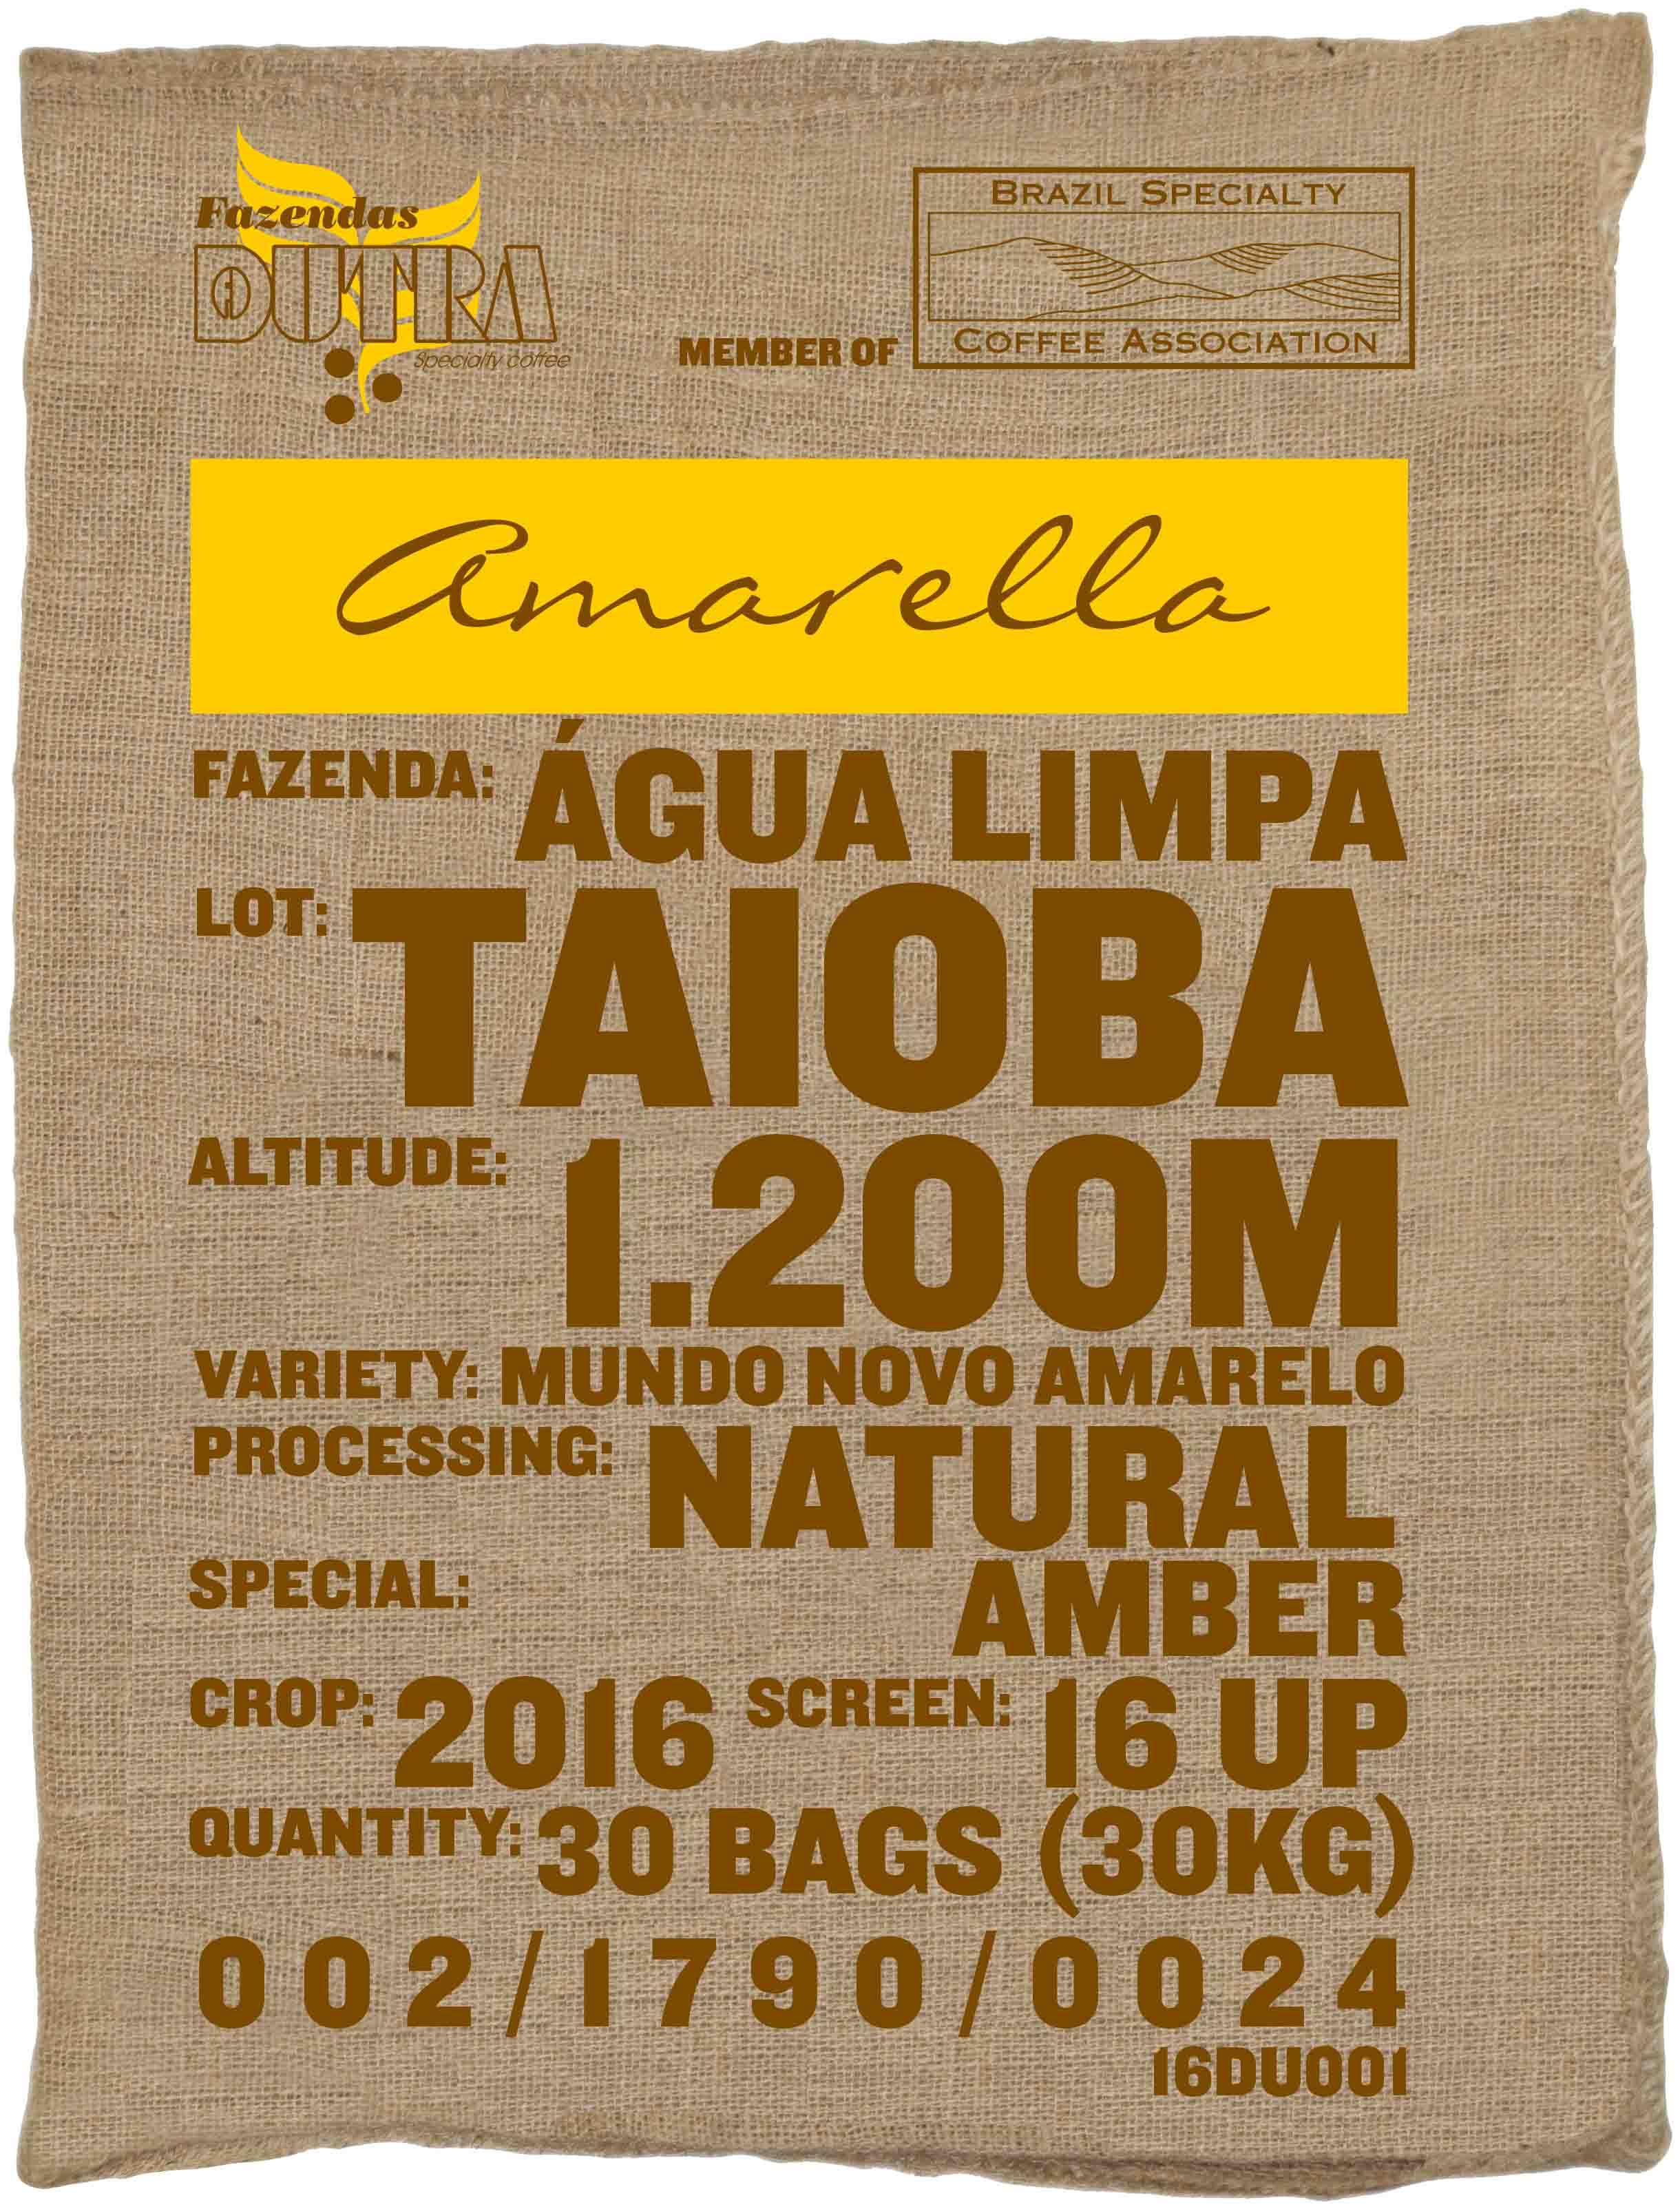 Ein Rohkaffeesack amarella Parzellenkaffee Varietät Mundo Novo amarelo. Fazendas Dutra Lot Taioba.